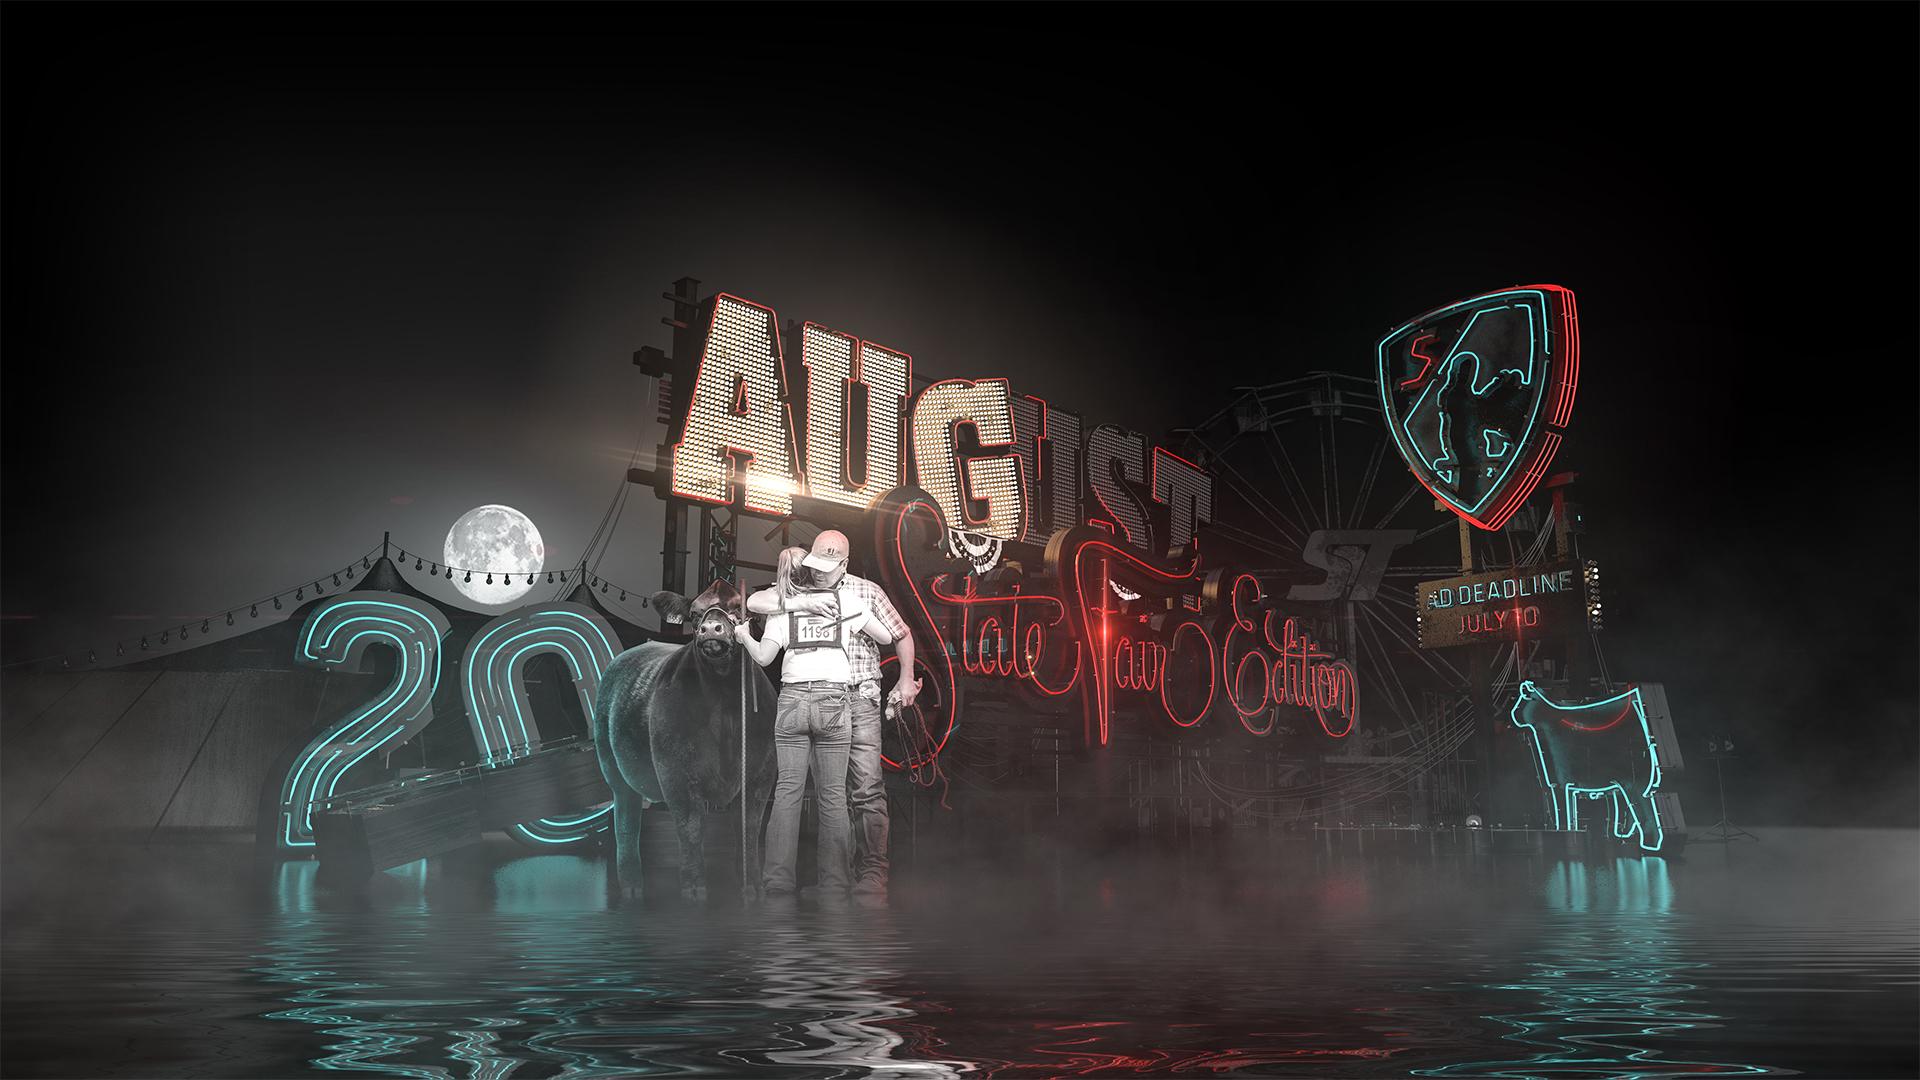 August 2020 Ad Deadline July 10